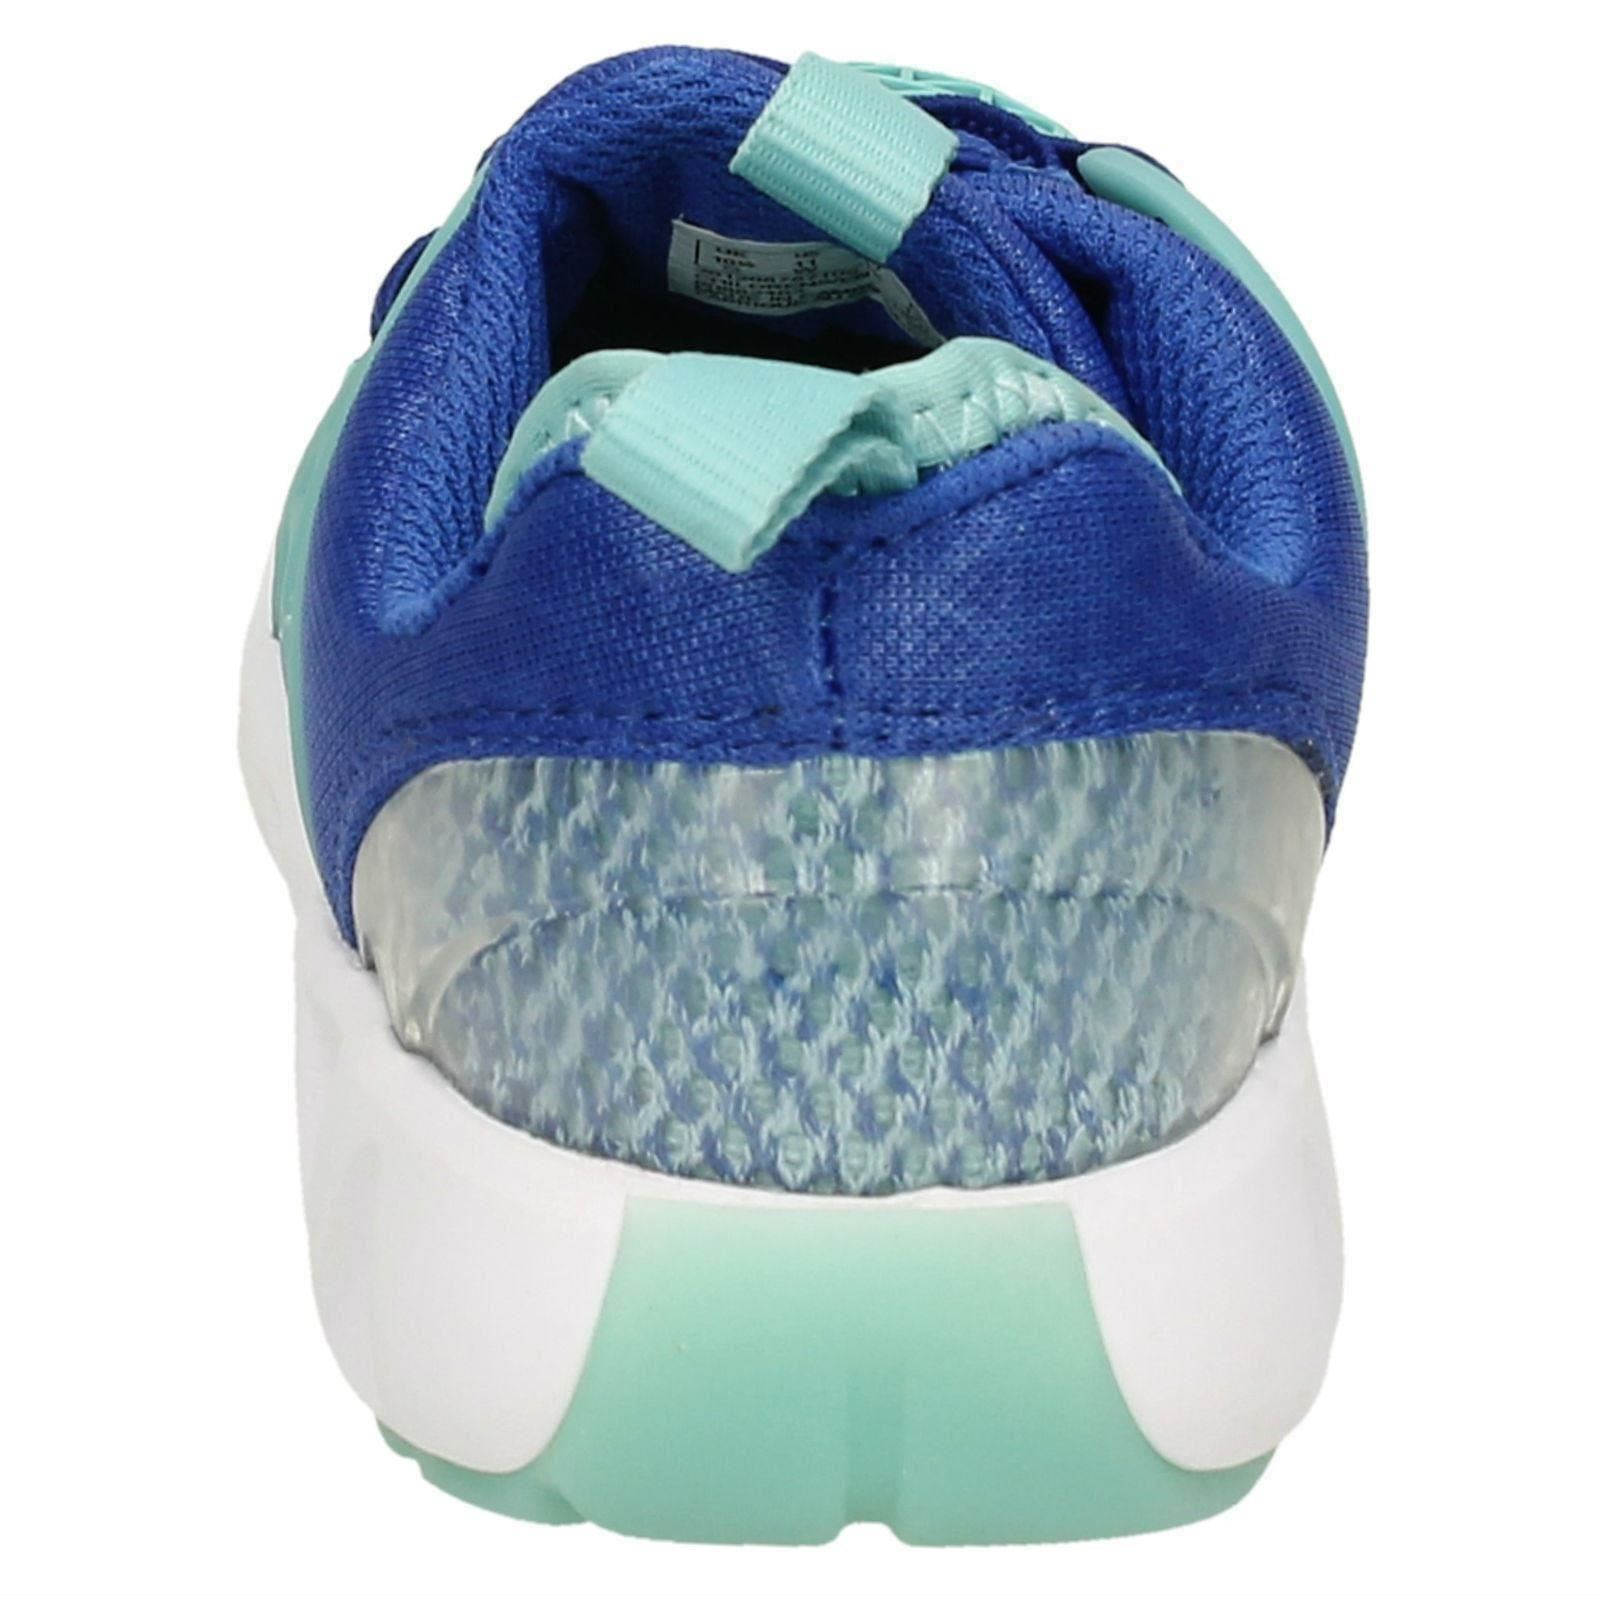 Filles Clarks gloforms Détail Dentelle Slip On Textile Sports Baskets Lumineuses Glo